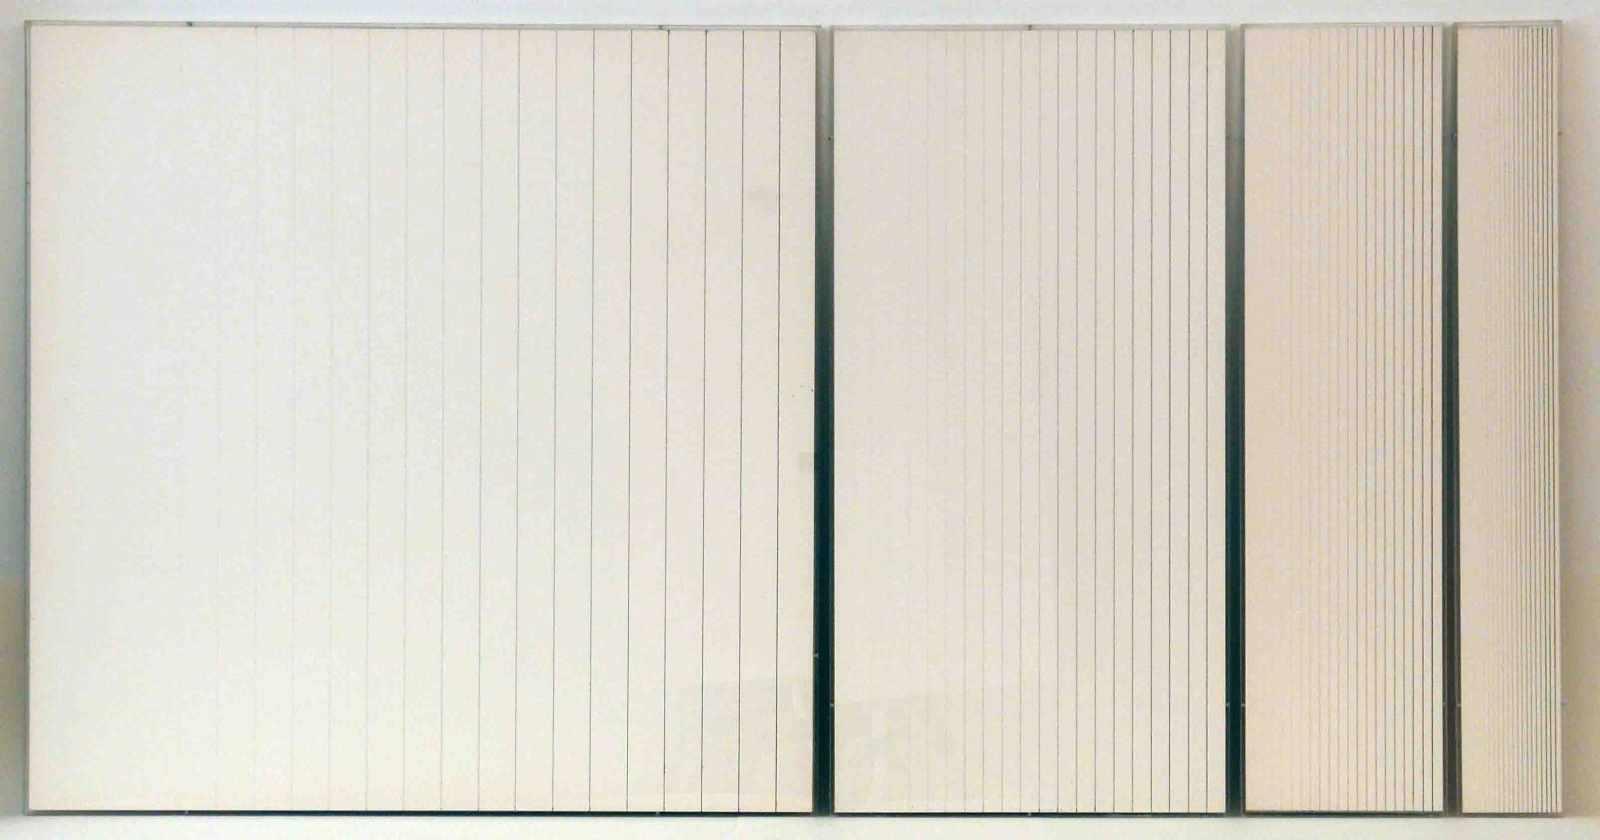 Lot 29 - Hartmut BöhmKassel 1938 - lebt in Berlin20 Bleistiftstriche 10 H – 8 B. P1 – P4. Sequenz von vier